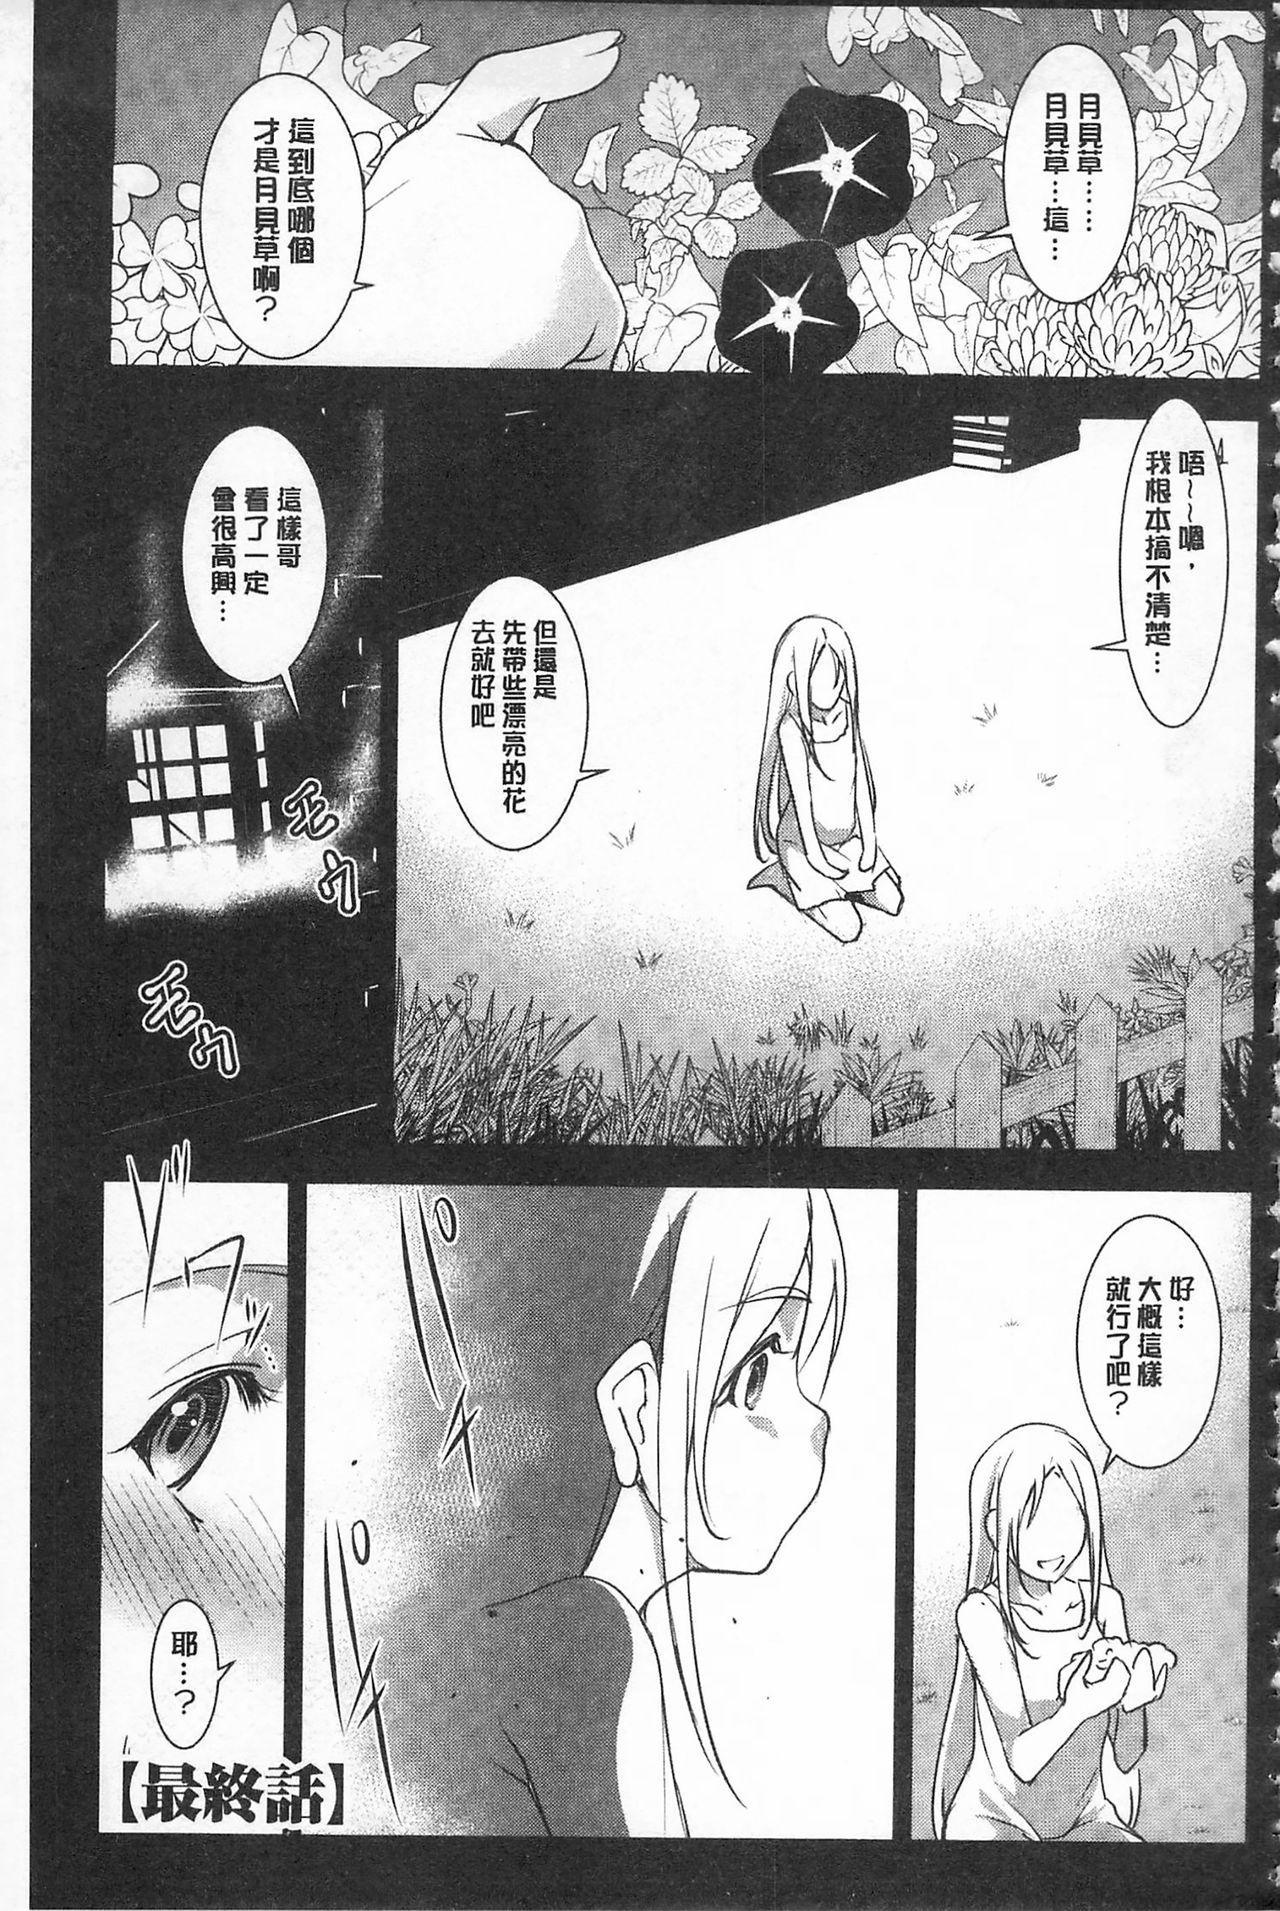 [Amano Kazumi] Seida Inyou -Seijo no Katachi Shita Intou- | 聖墮陰陽 -聖女的容貌與淫蕩- [Chinese] 132